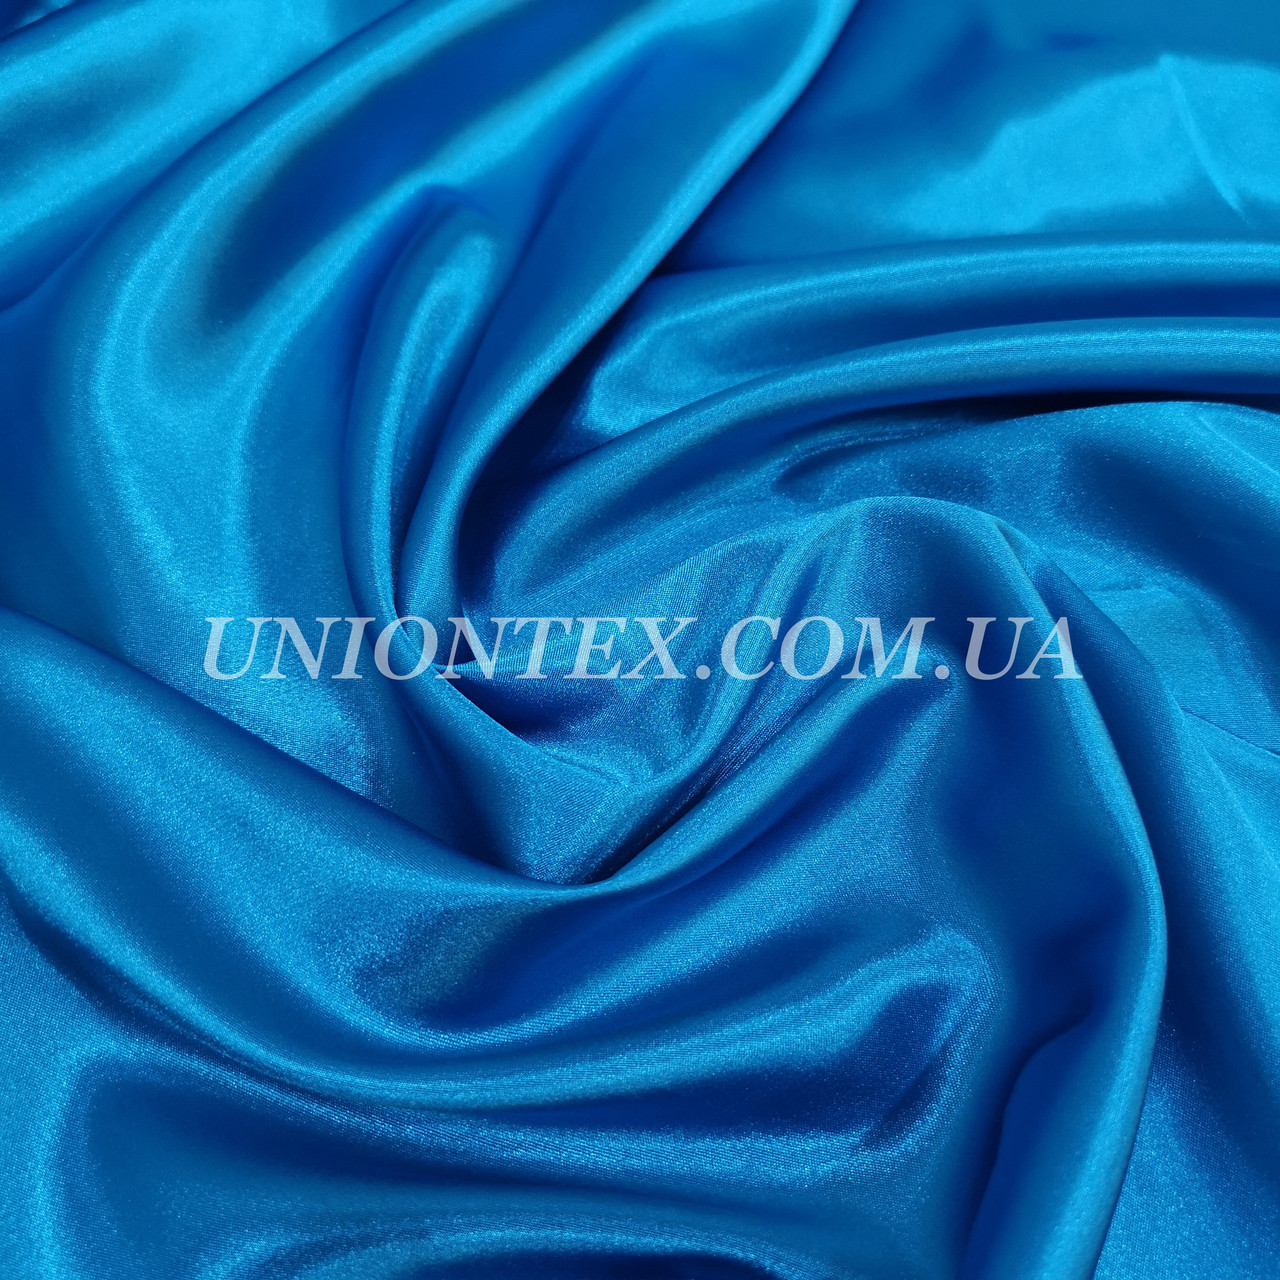 Ткань атлас стрейч голубая бирюза